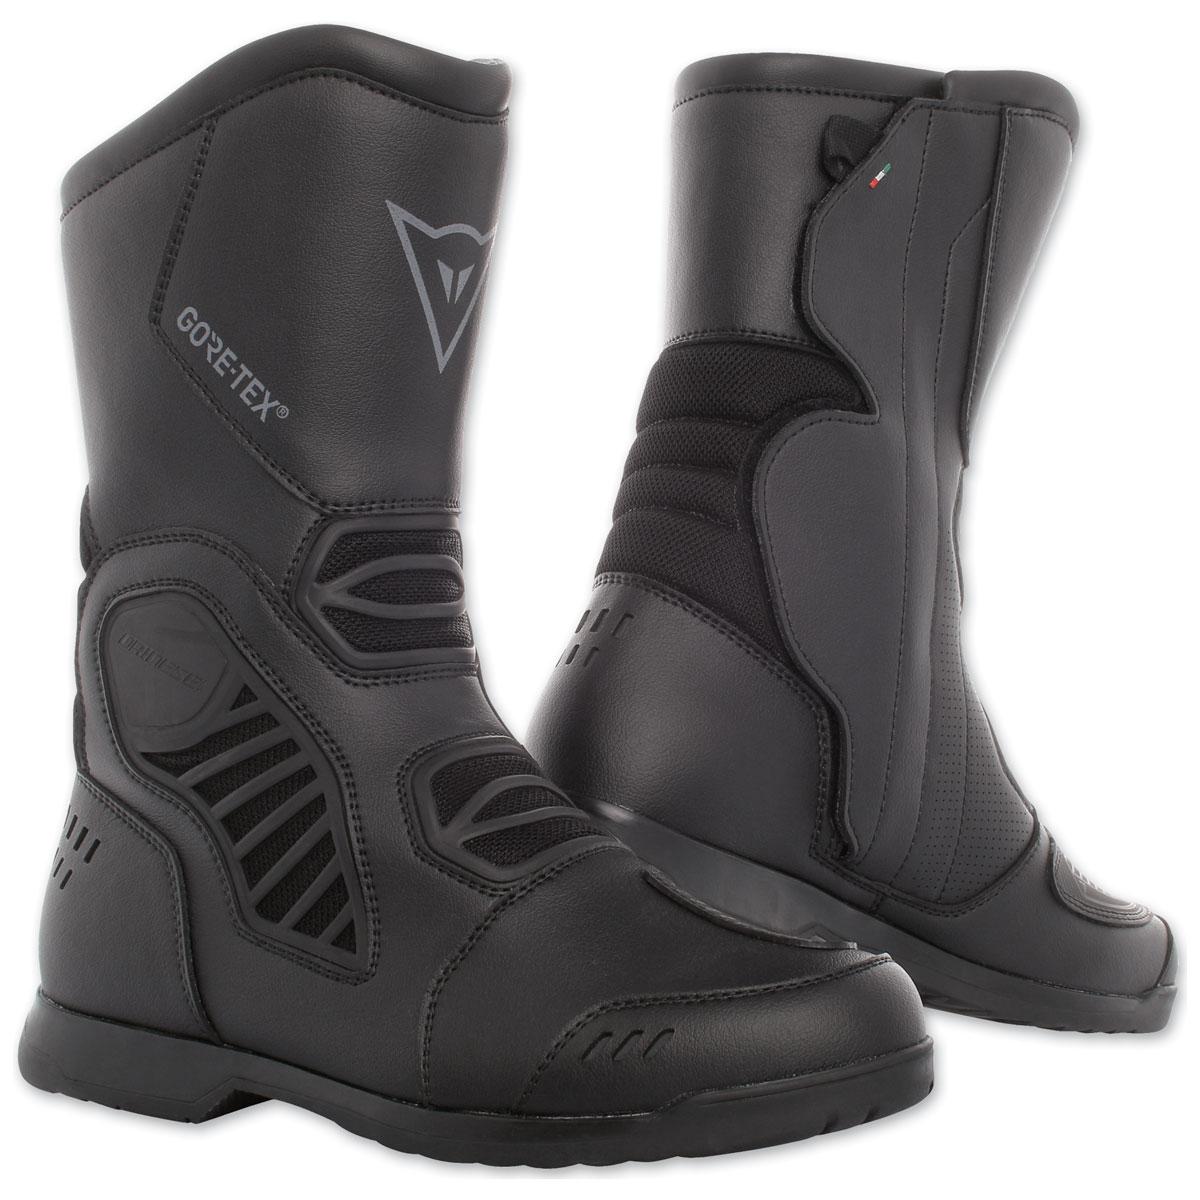 Dainese Men's Solarys Gore-Tex Black Boots